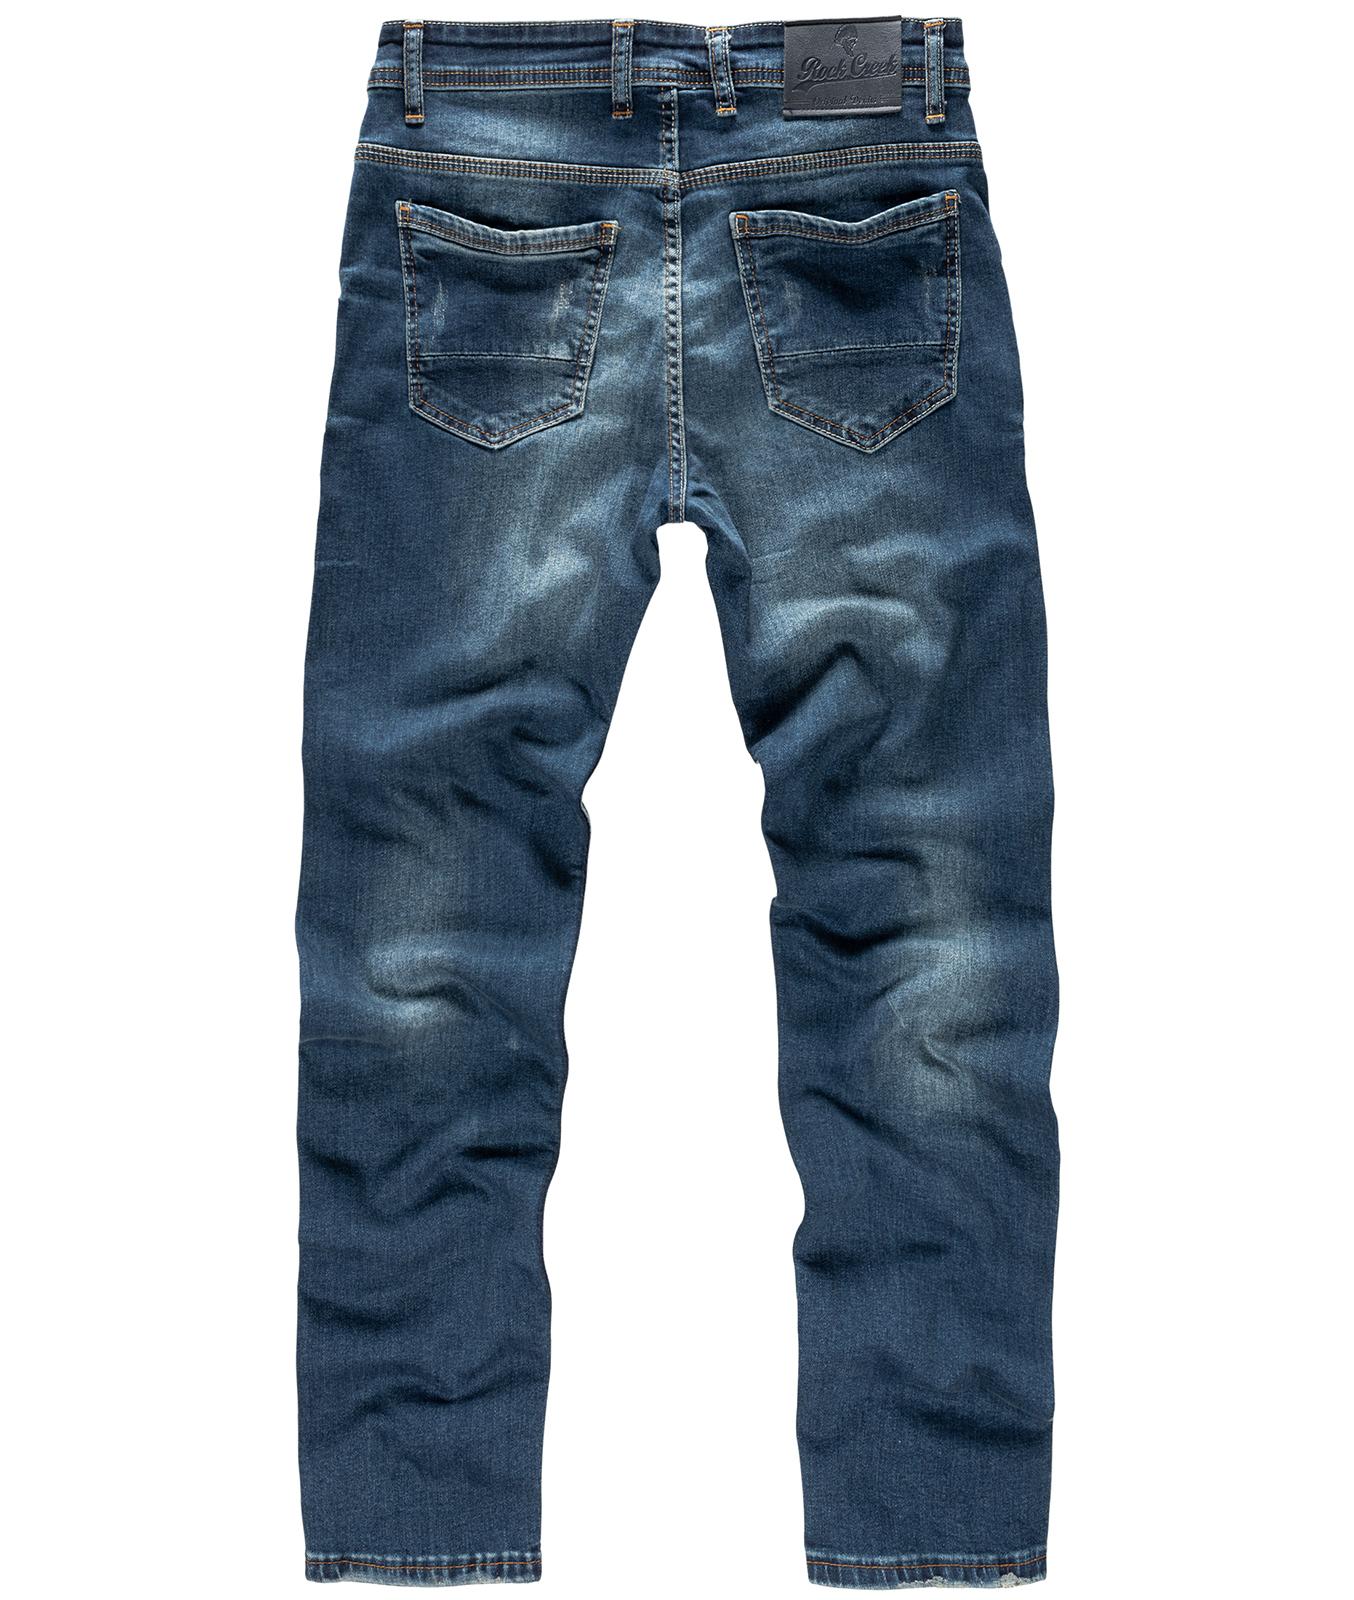 443aded191c99 Designer Herren Jeans Denim Herrenhose Stretch Jeanshose Creek Rock ...